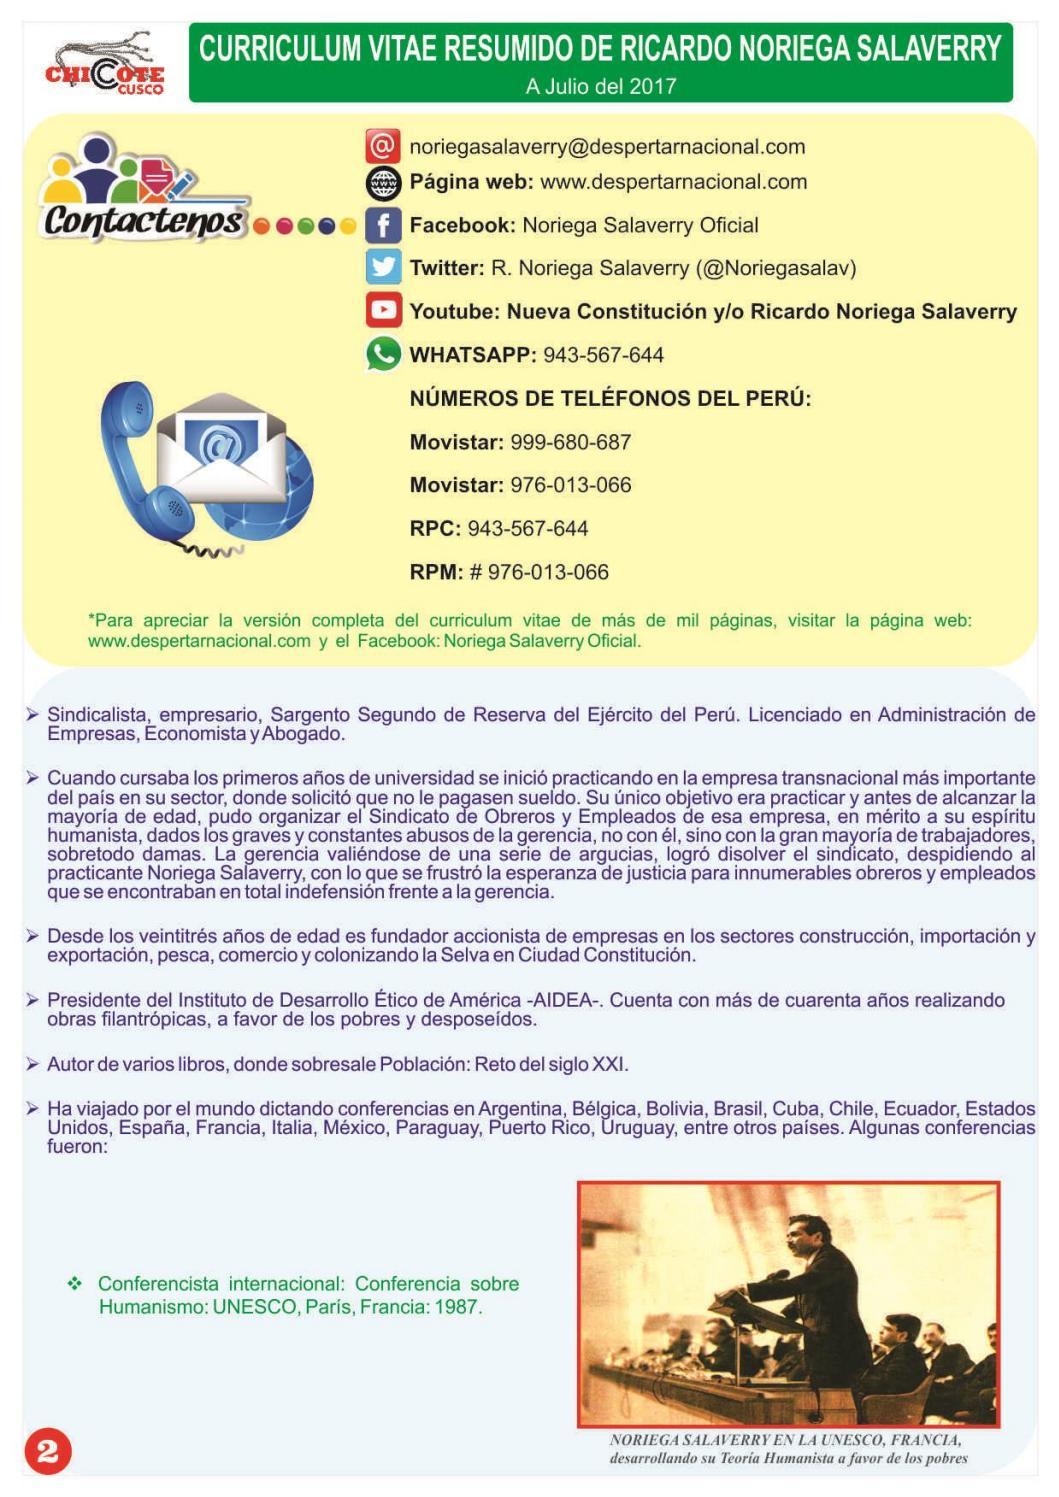 CURRICULUM VITAE DR. RICARDO NORIEGA SALAVERRY by DESPERTAR NACIONAL ...